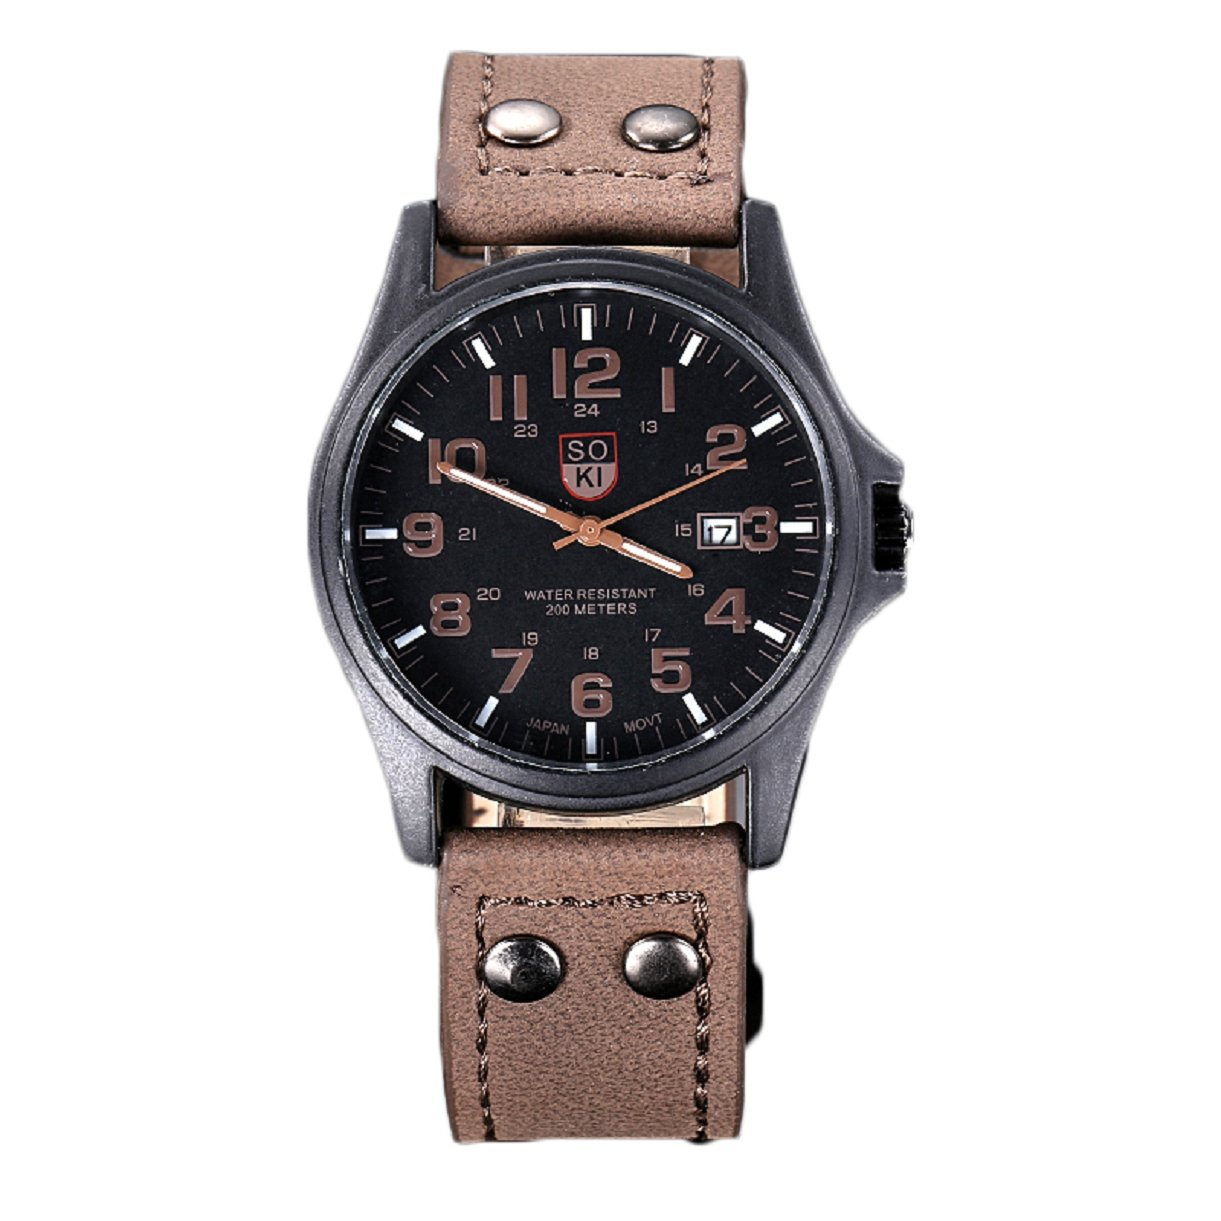 Amazon.com: Lookatool Vintage Classic Mens Waterproof Date Leather Strap Sport Quartz Army Watch: Lookatool: Watches